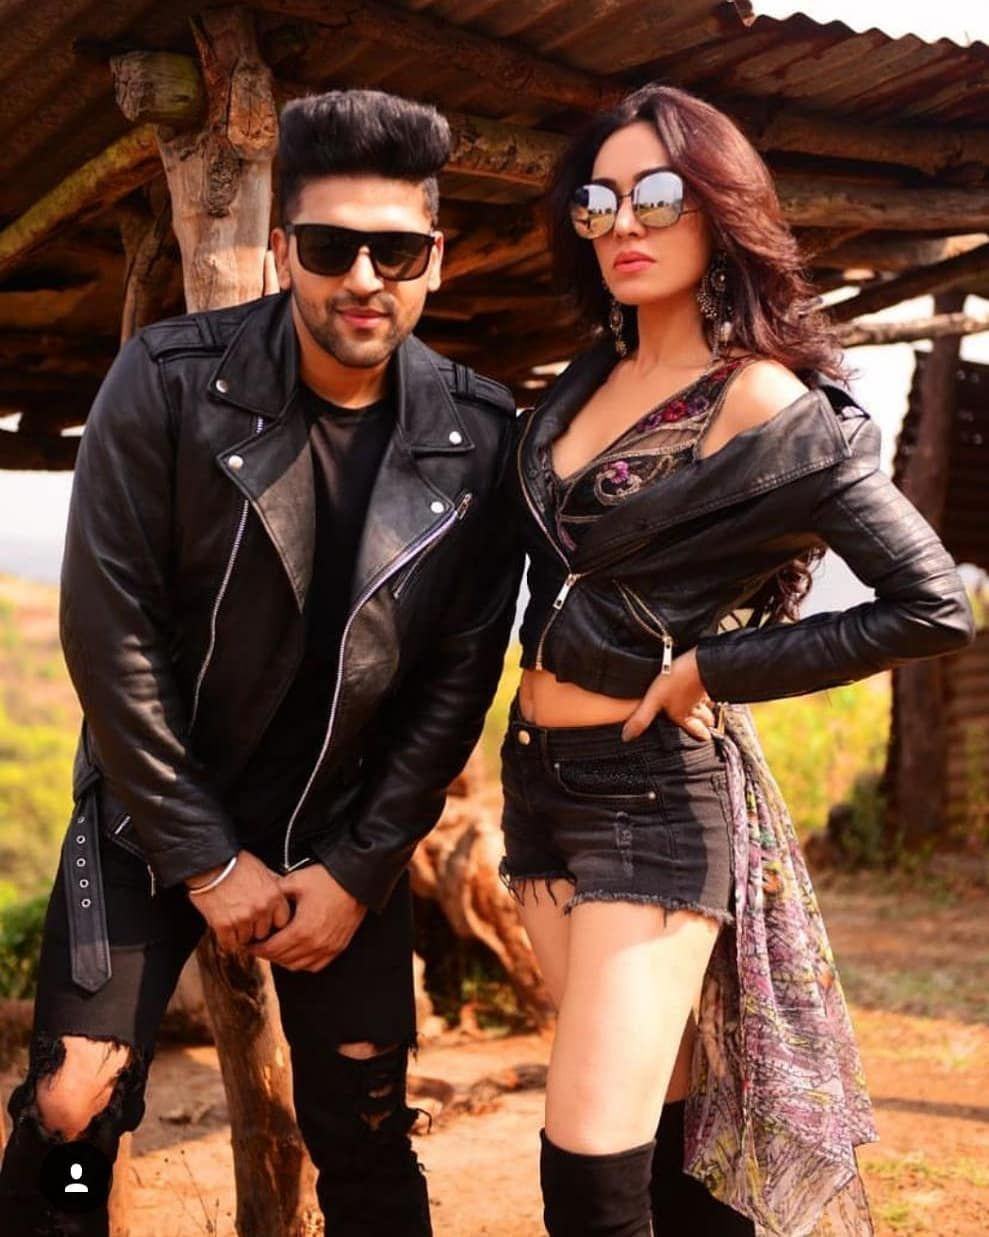 Gururandhawa And Khushalikumar Release Thier Foot Tapping Song Raat Kamaal Hai On Tseries Youtube Channel Check It Out Gur Guru Pics Love Guru Tap Songs